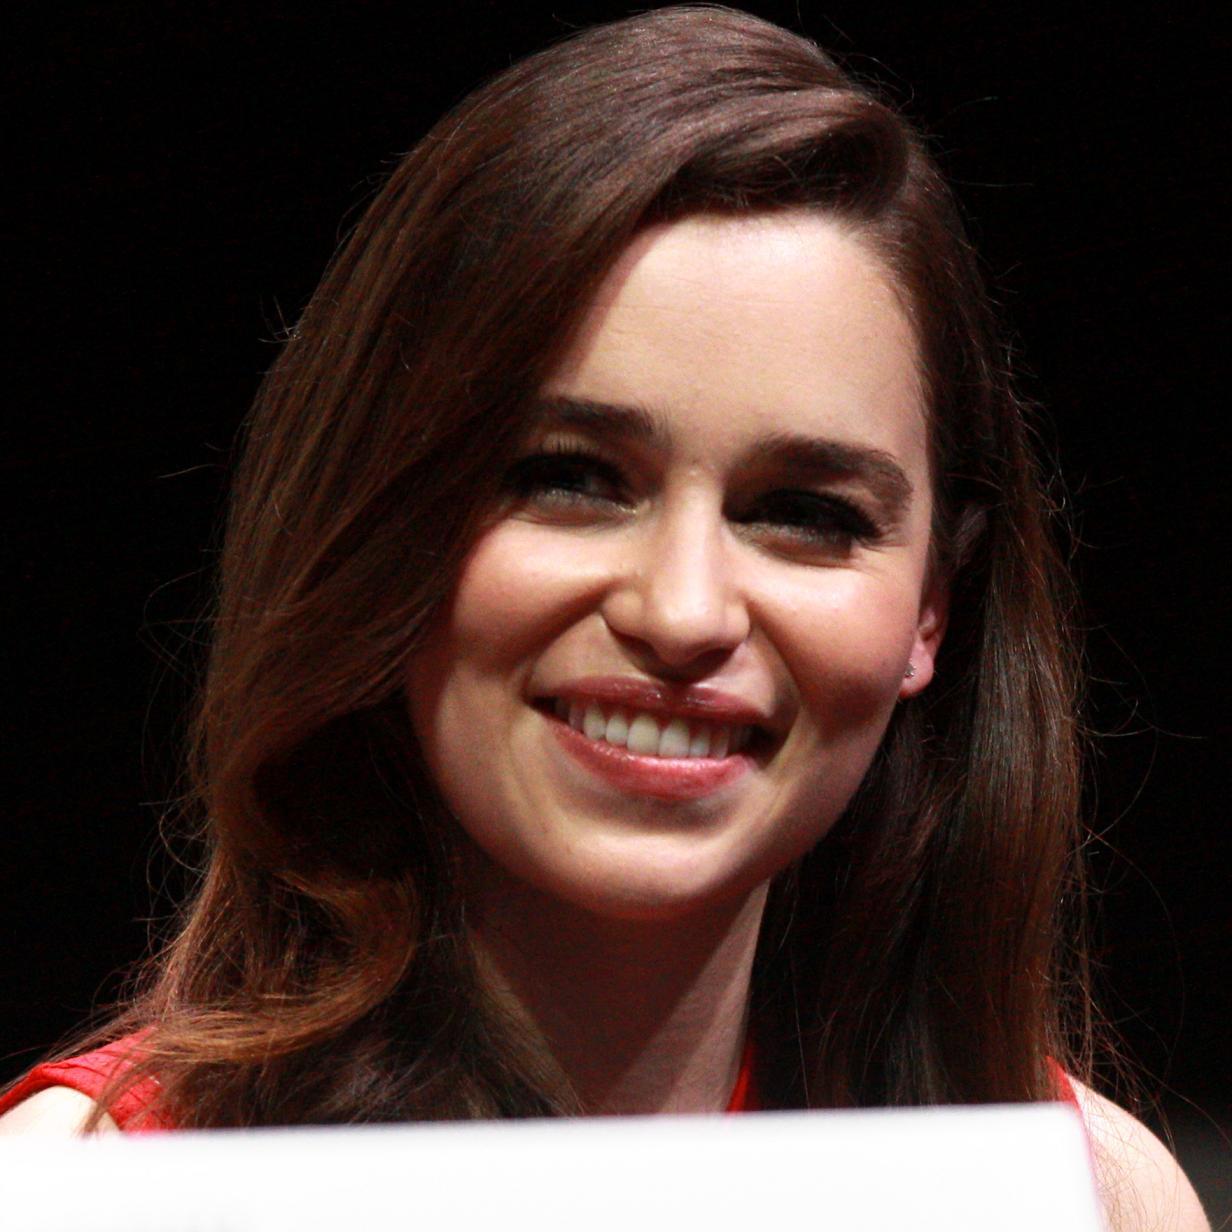 Emilia Clarke Bio, Net Worth, Facts